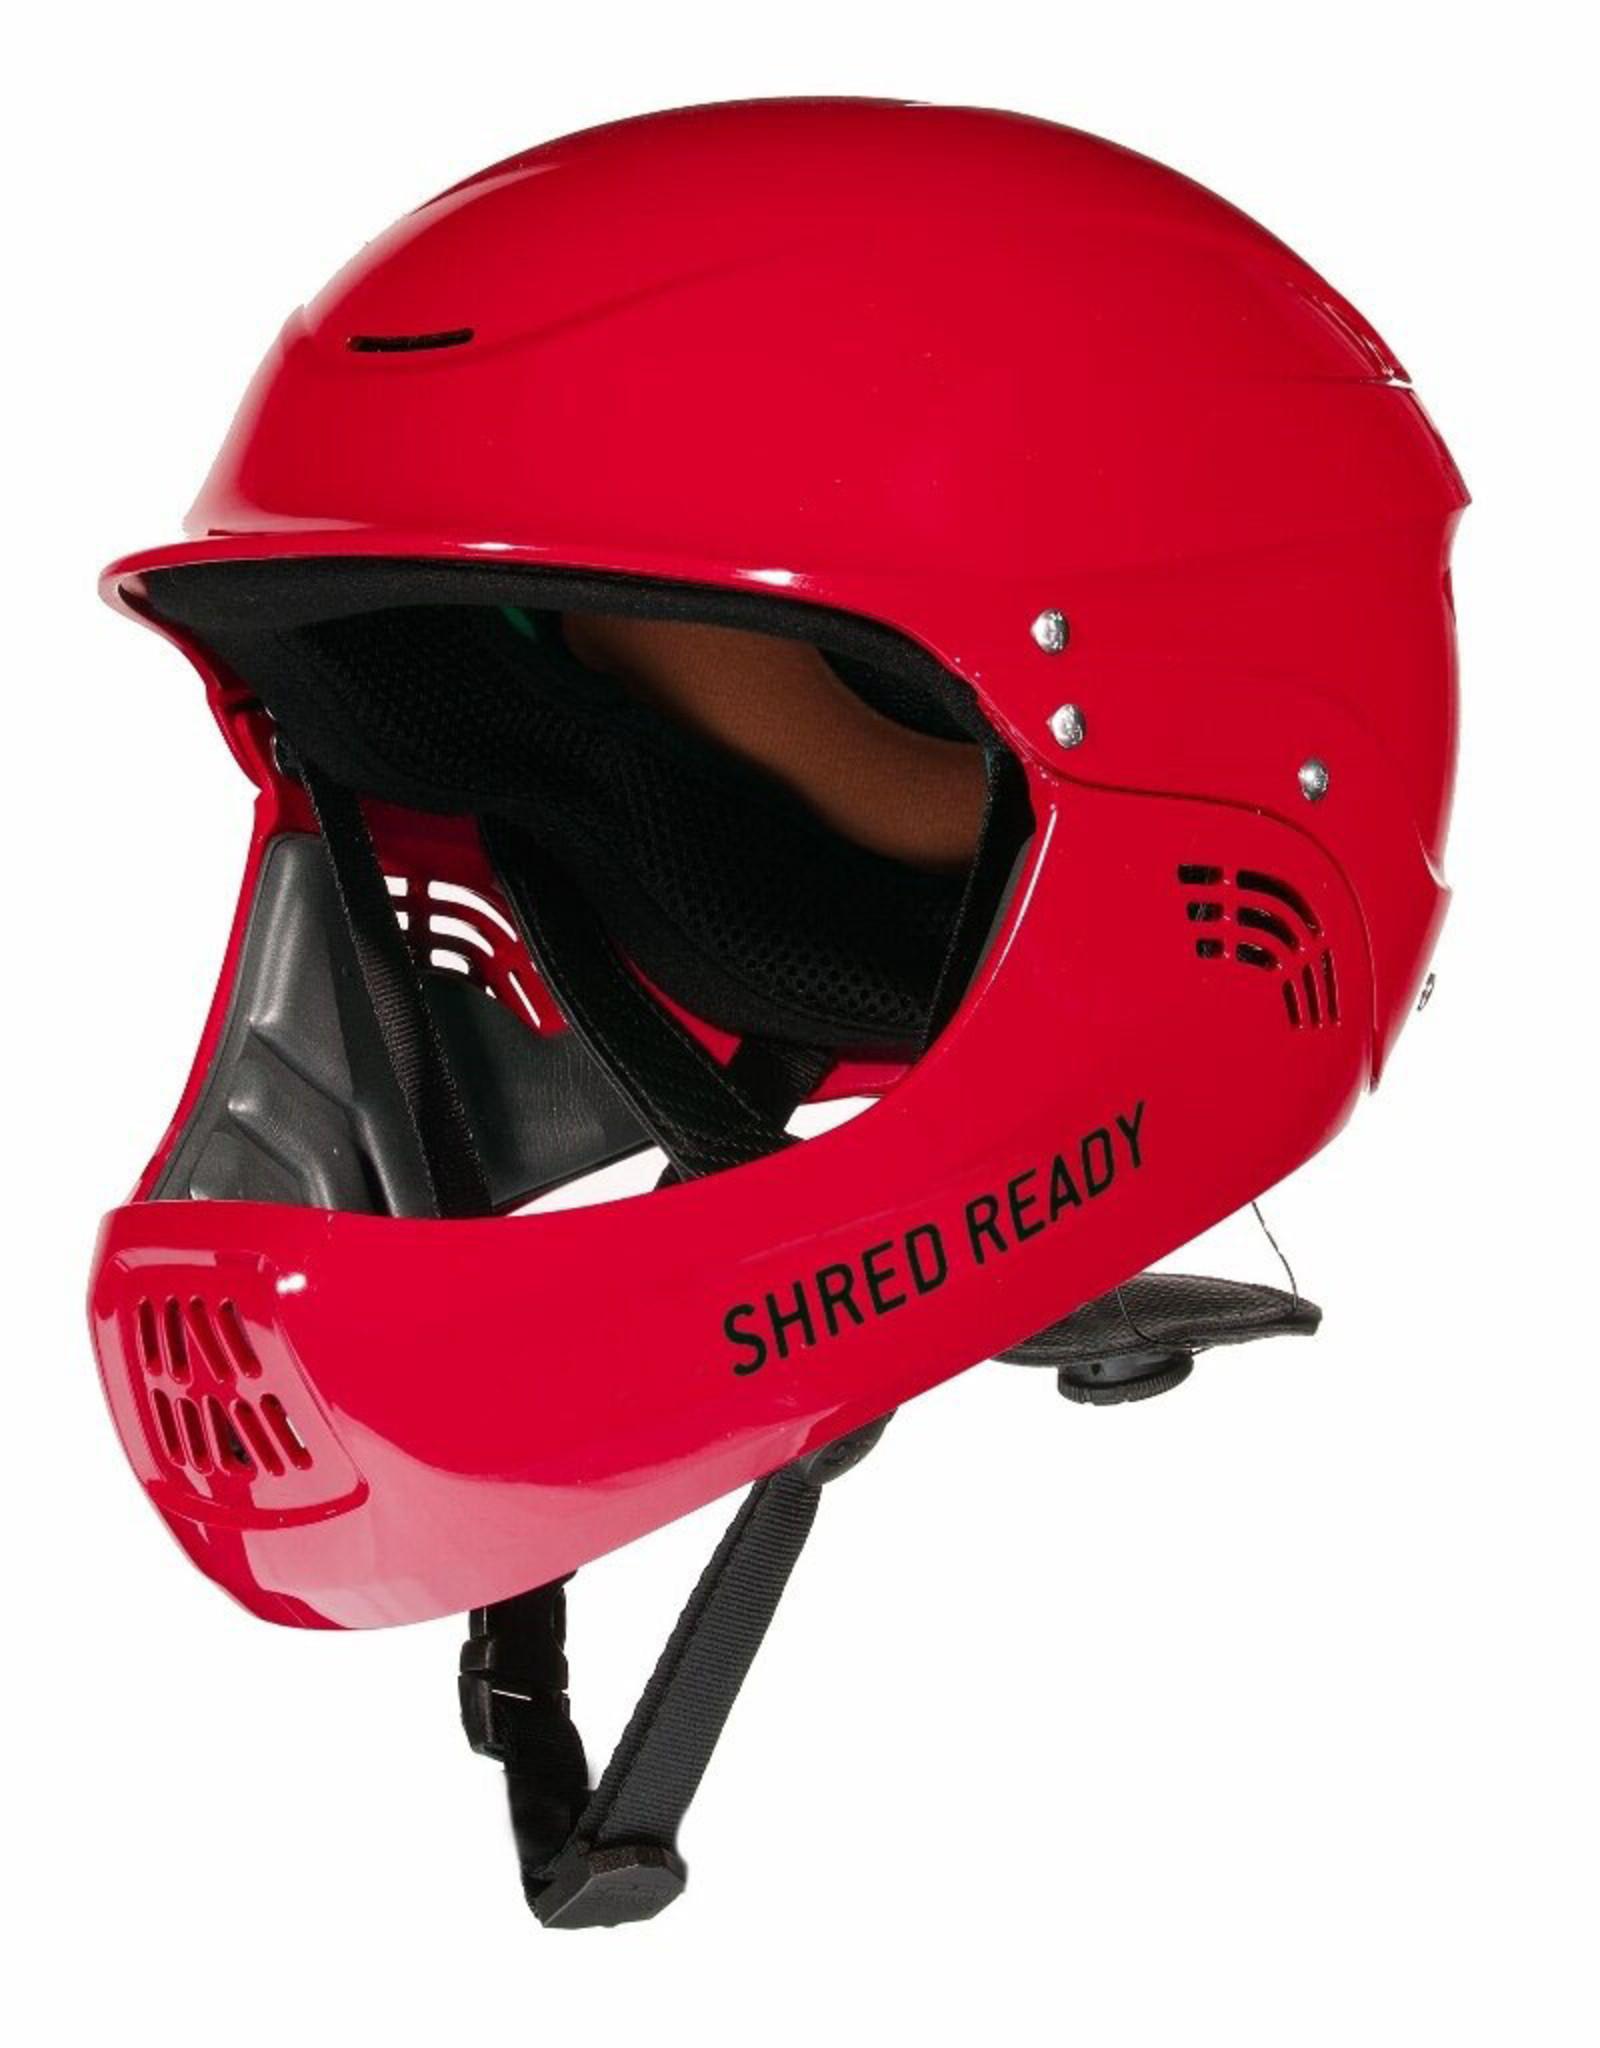 Shred Ready Shred Ready Std Full Face Helmet -  Discontinued